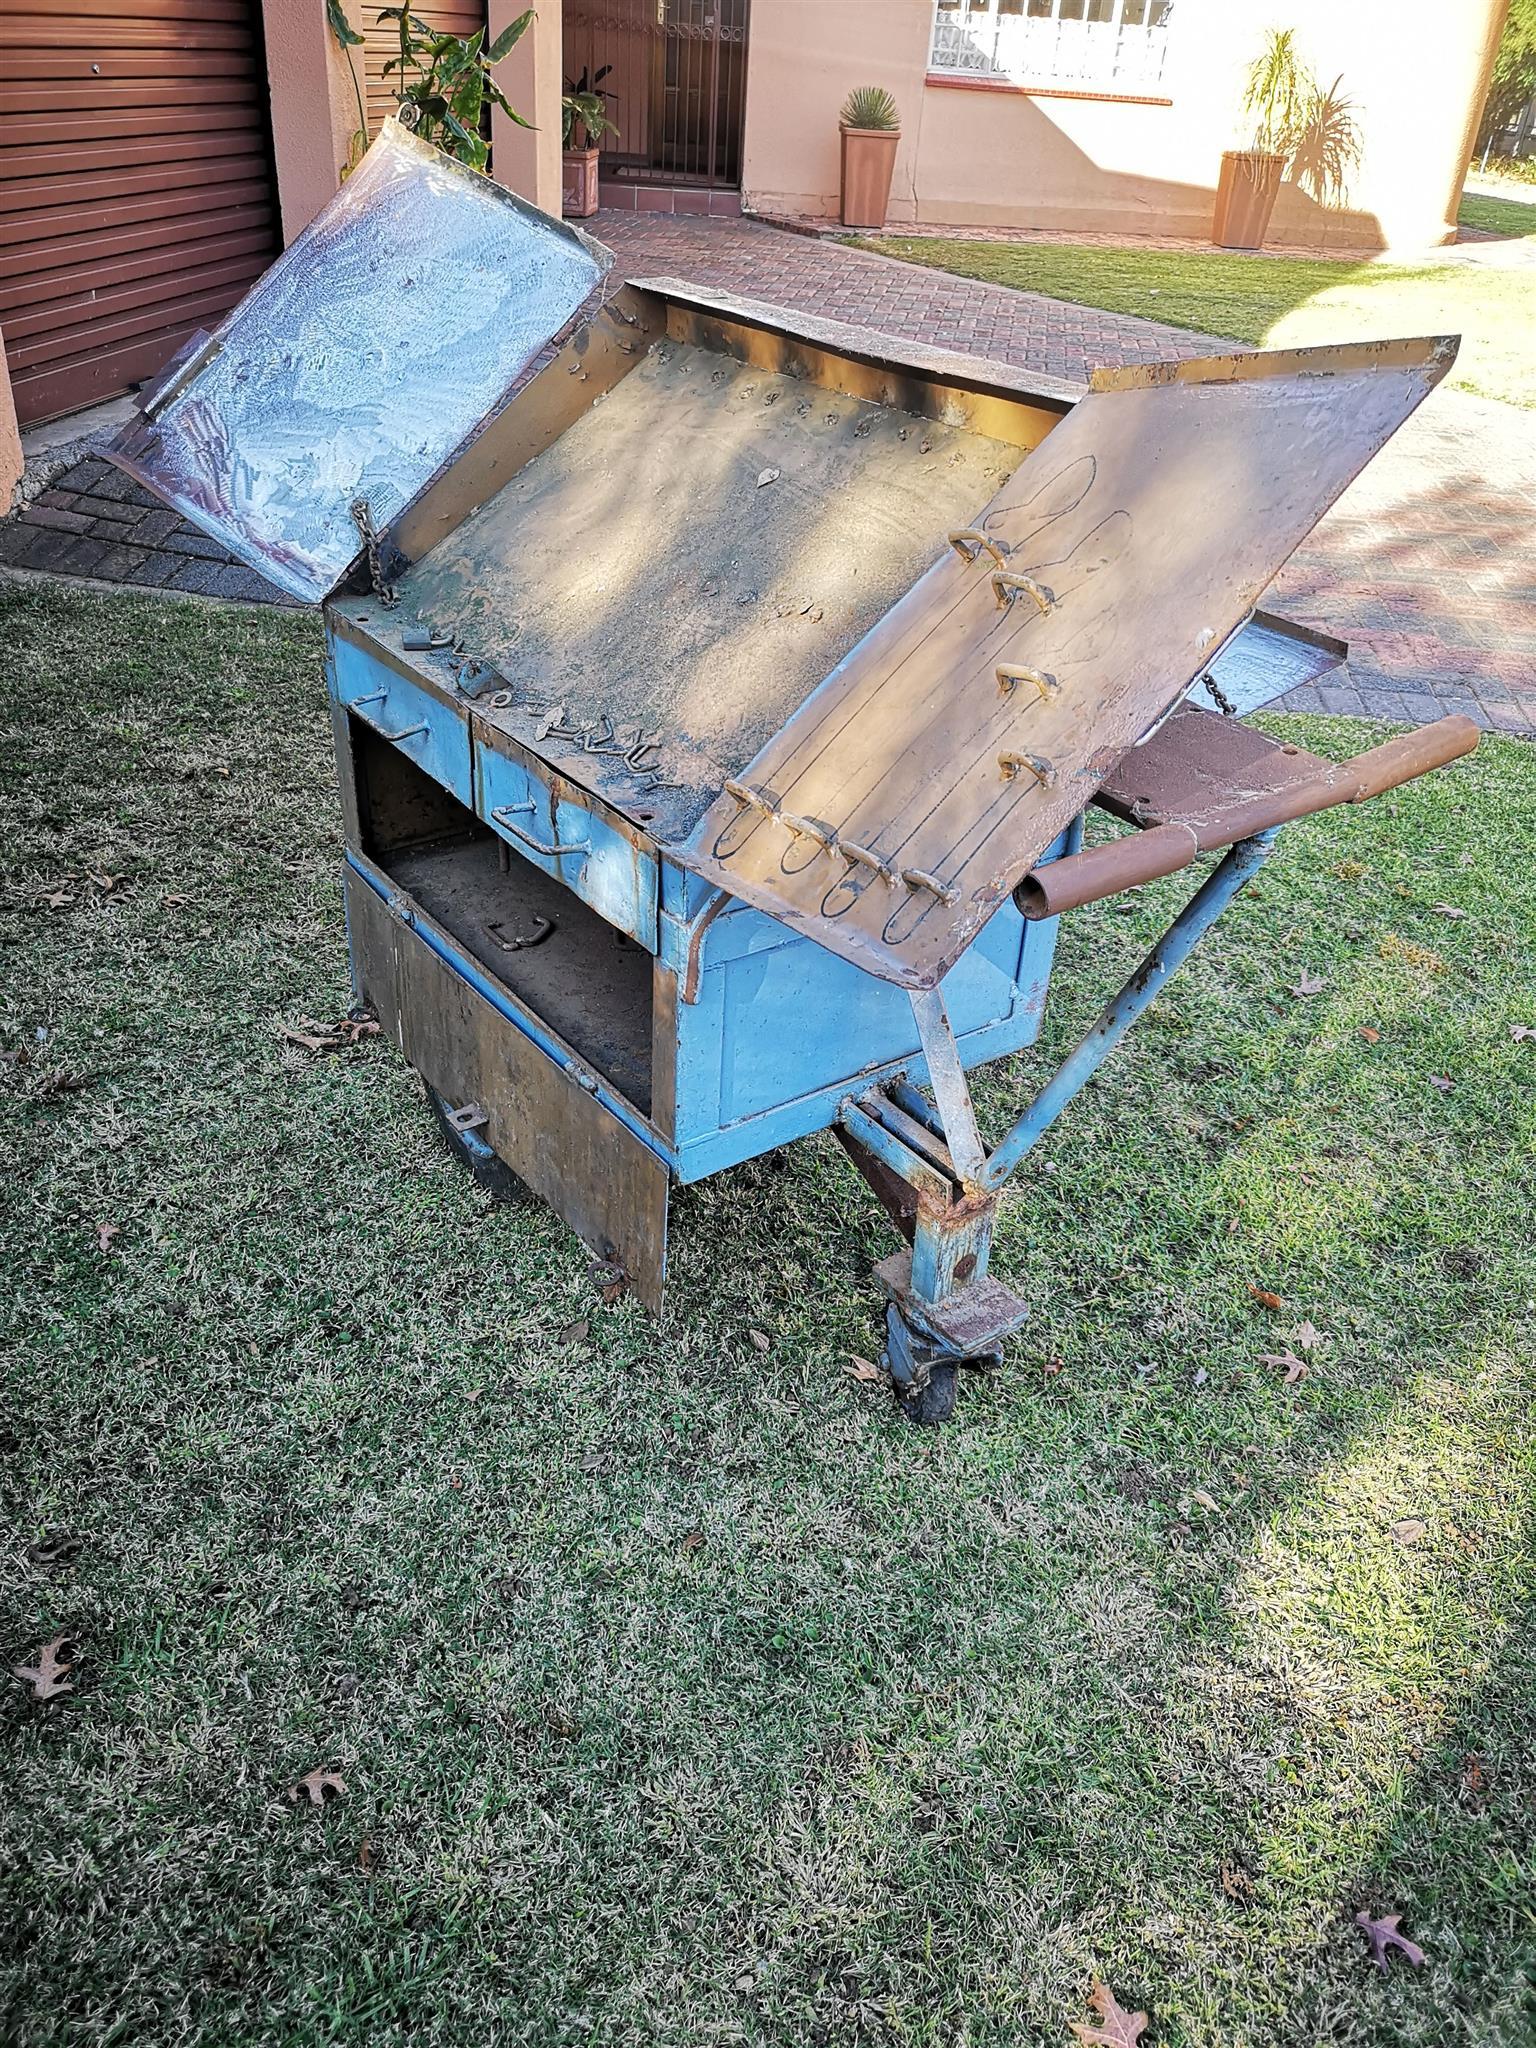 Toolbox heavy dudy industrial.